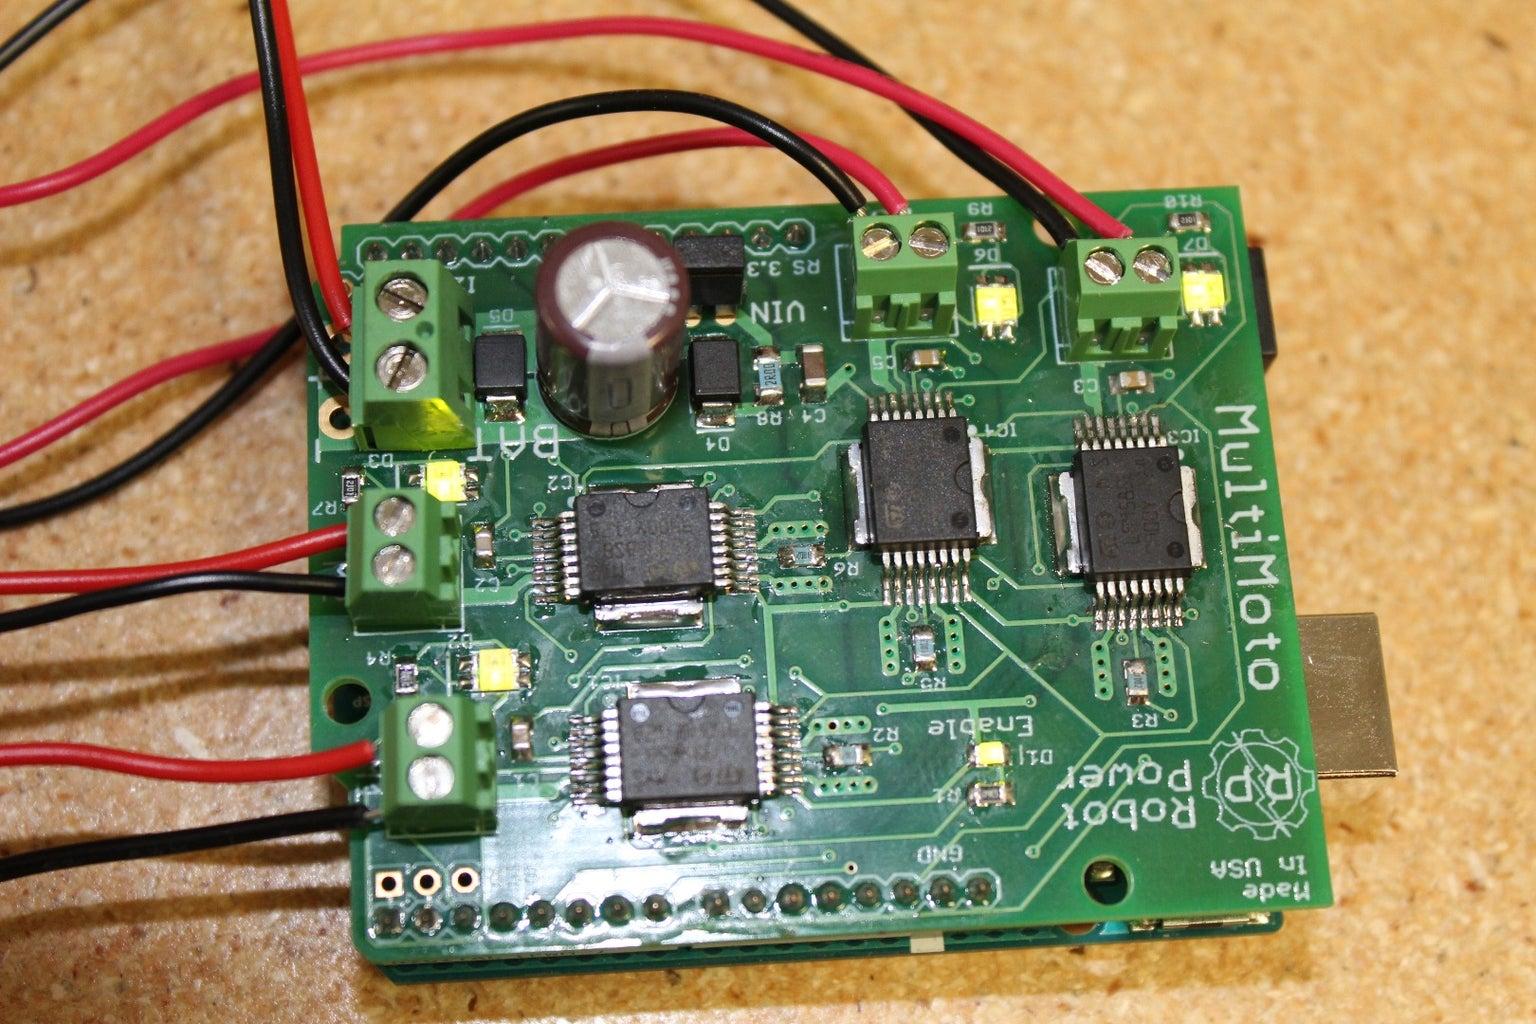 Wiring the Board